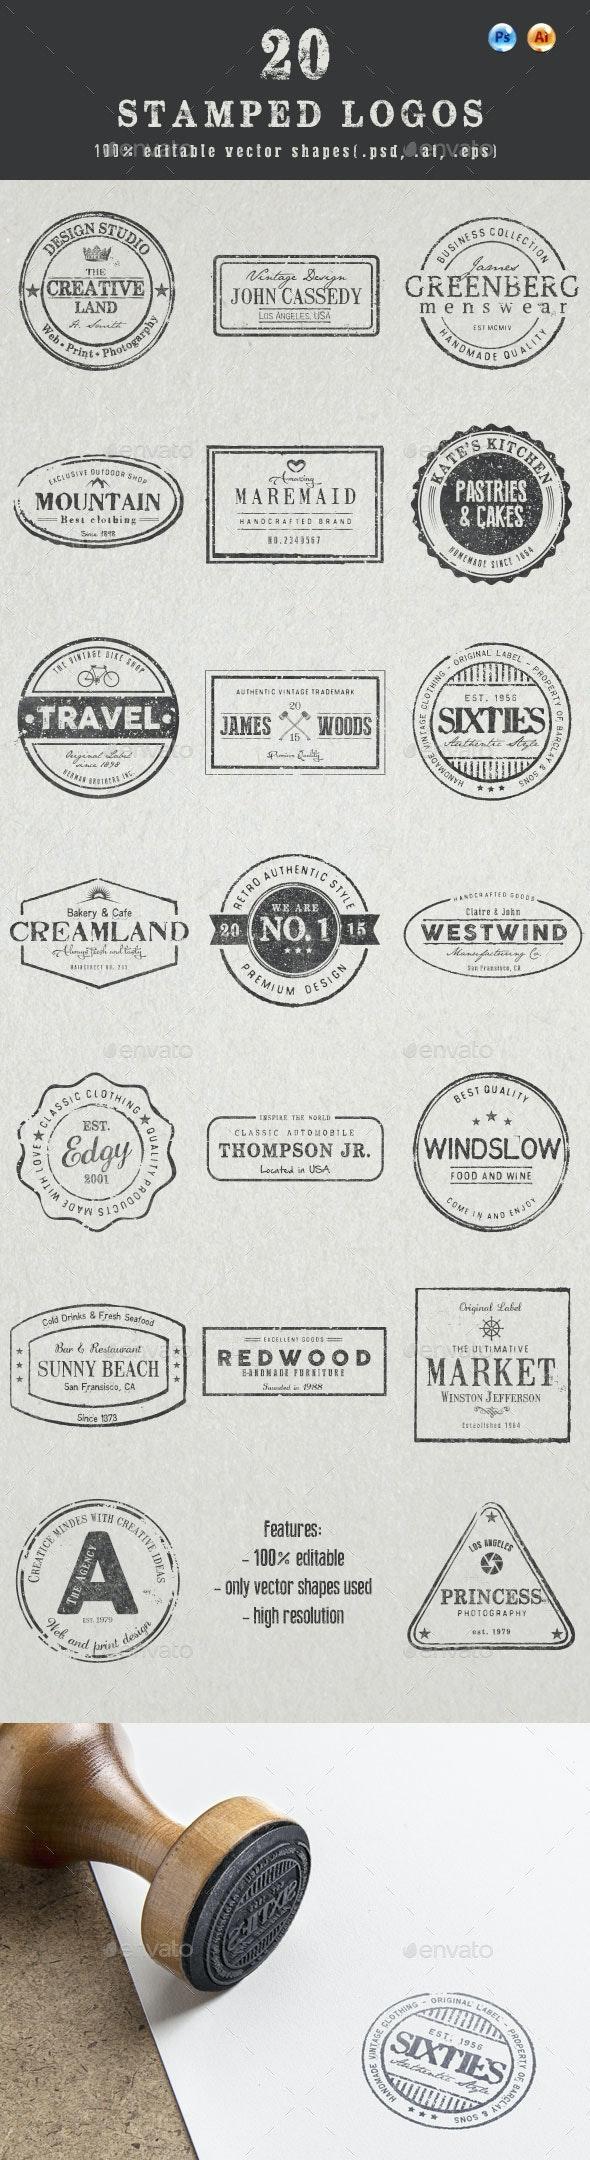 20 Stamped Logos (Photoshop & Illustrator) - Badges & Stickers Web Elements